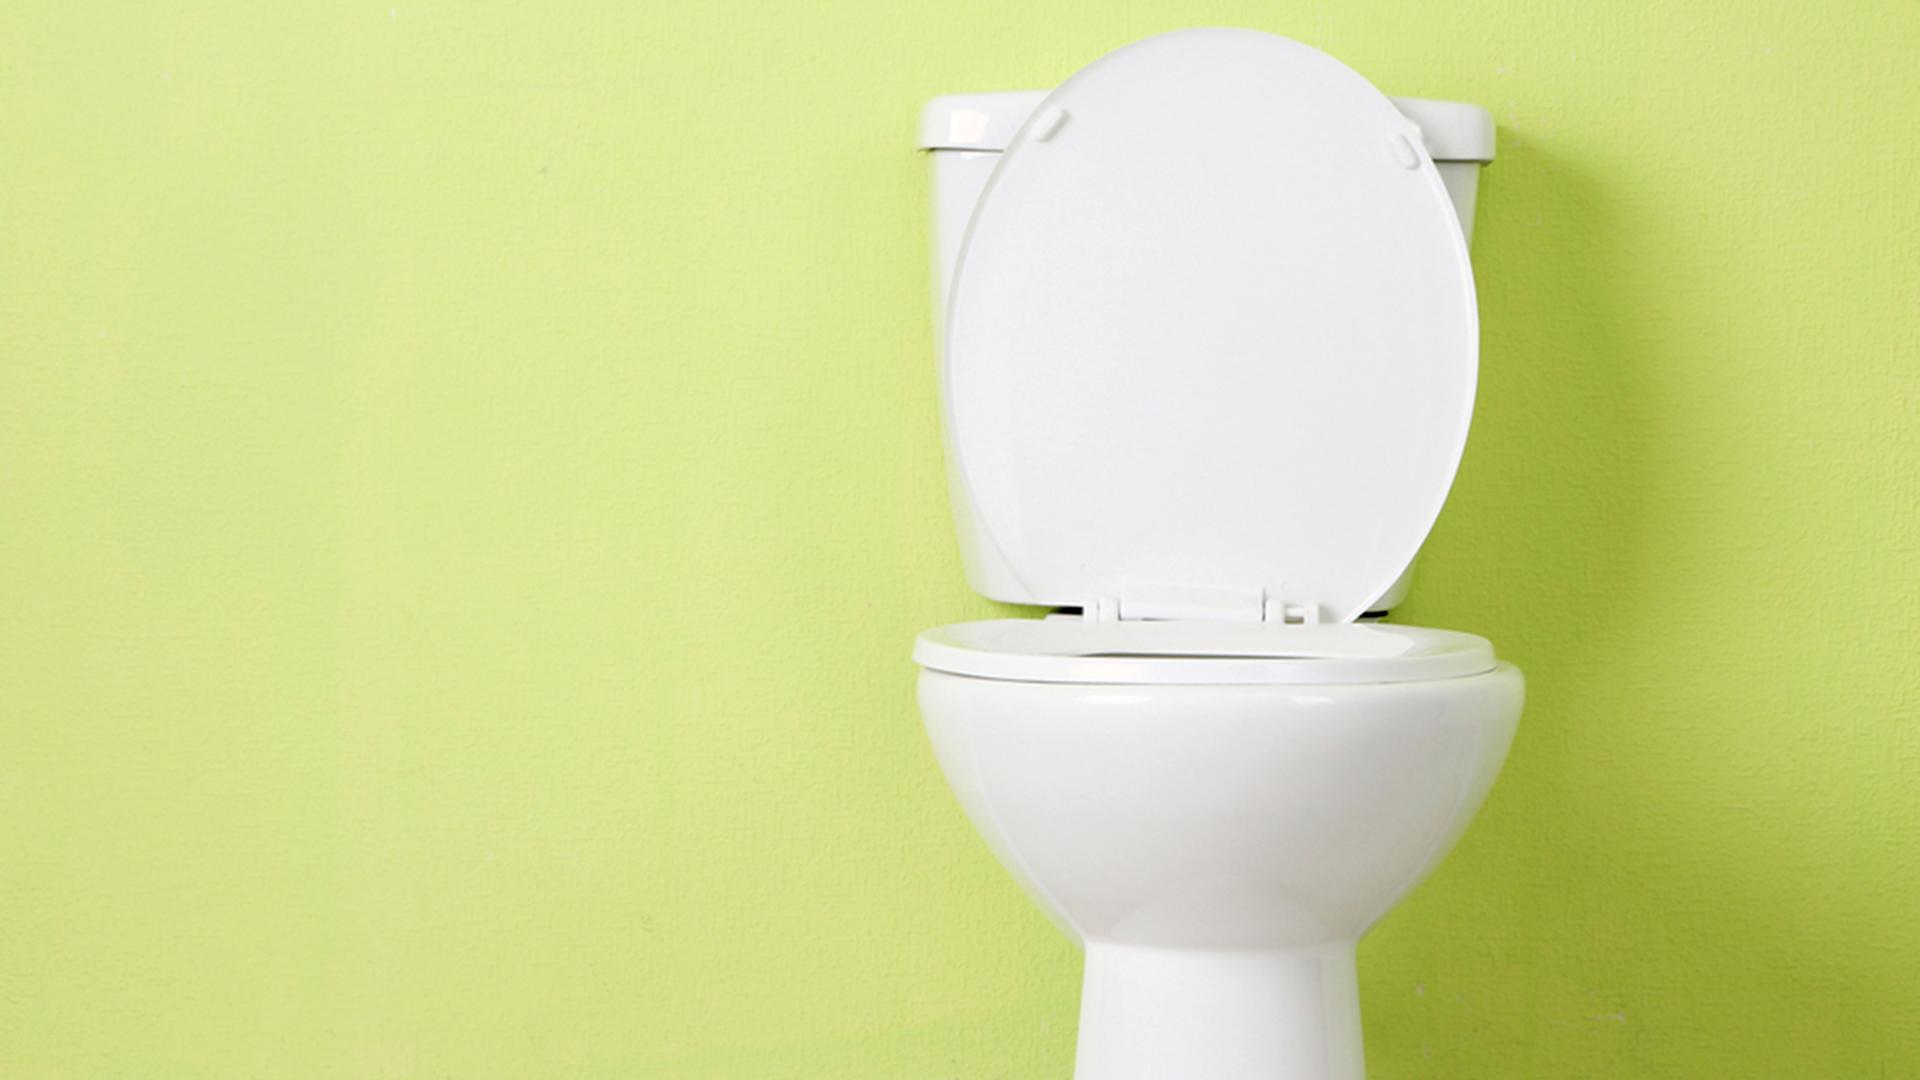 Coca Cola Fridge >> How to clean the toilet with Coca-Cola - TODAY.com